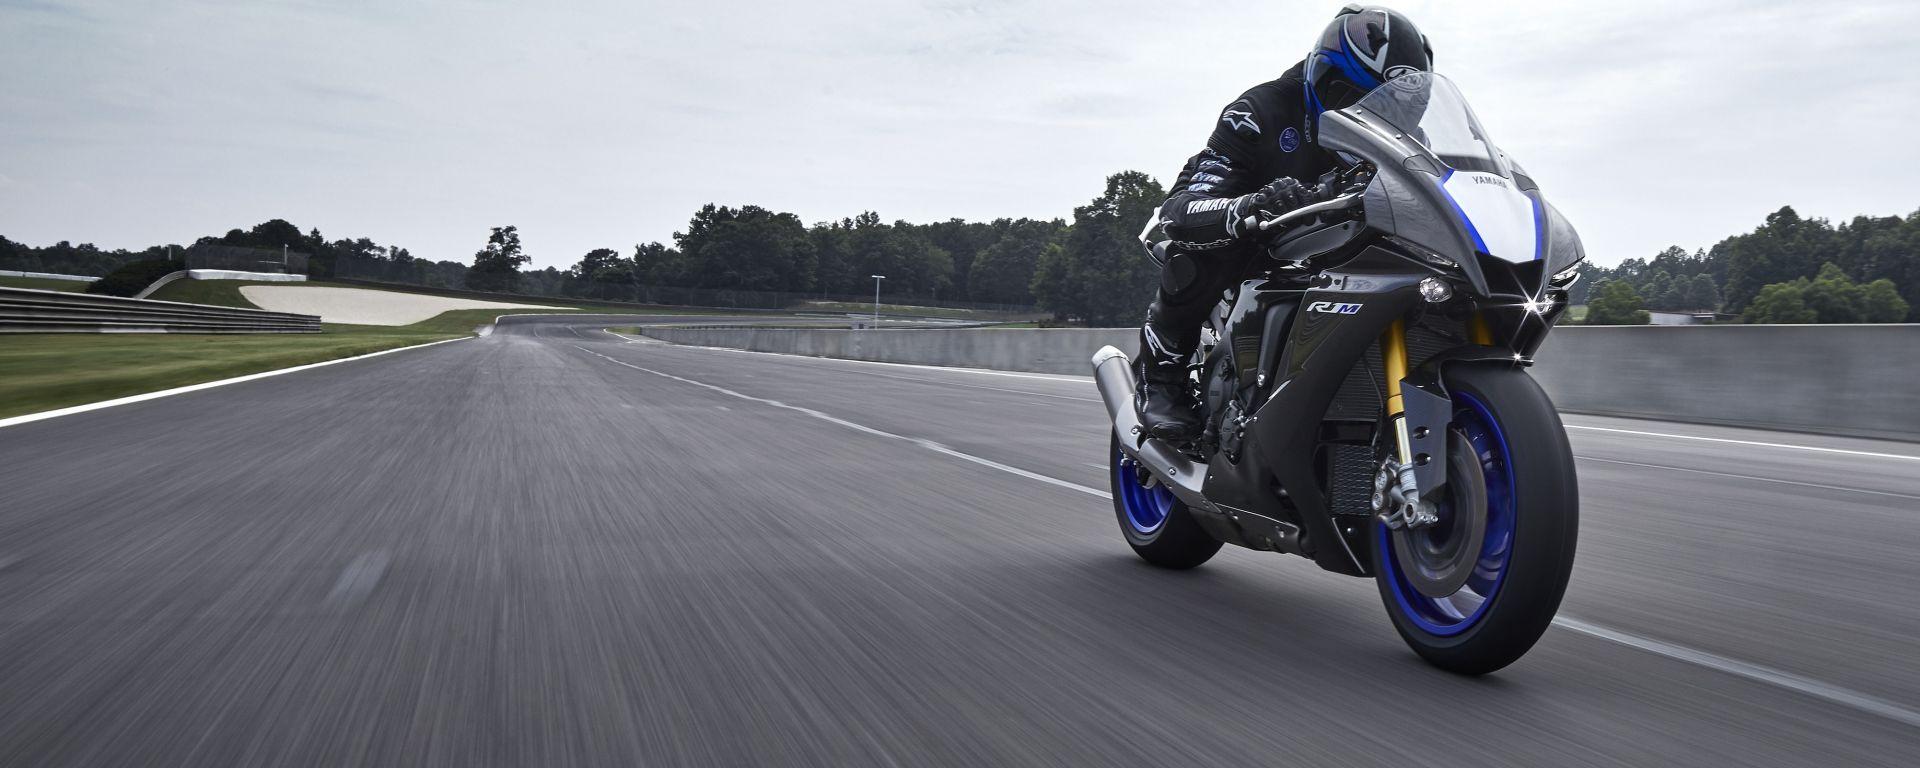 Gas spalancato con la Yamaha YZF-R1M 2020